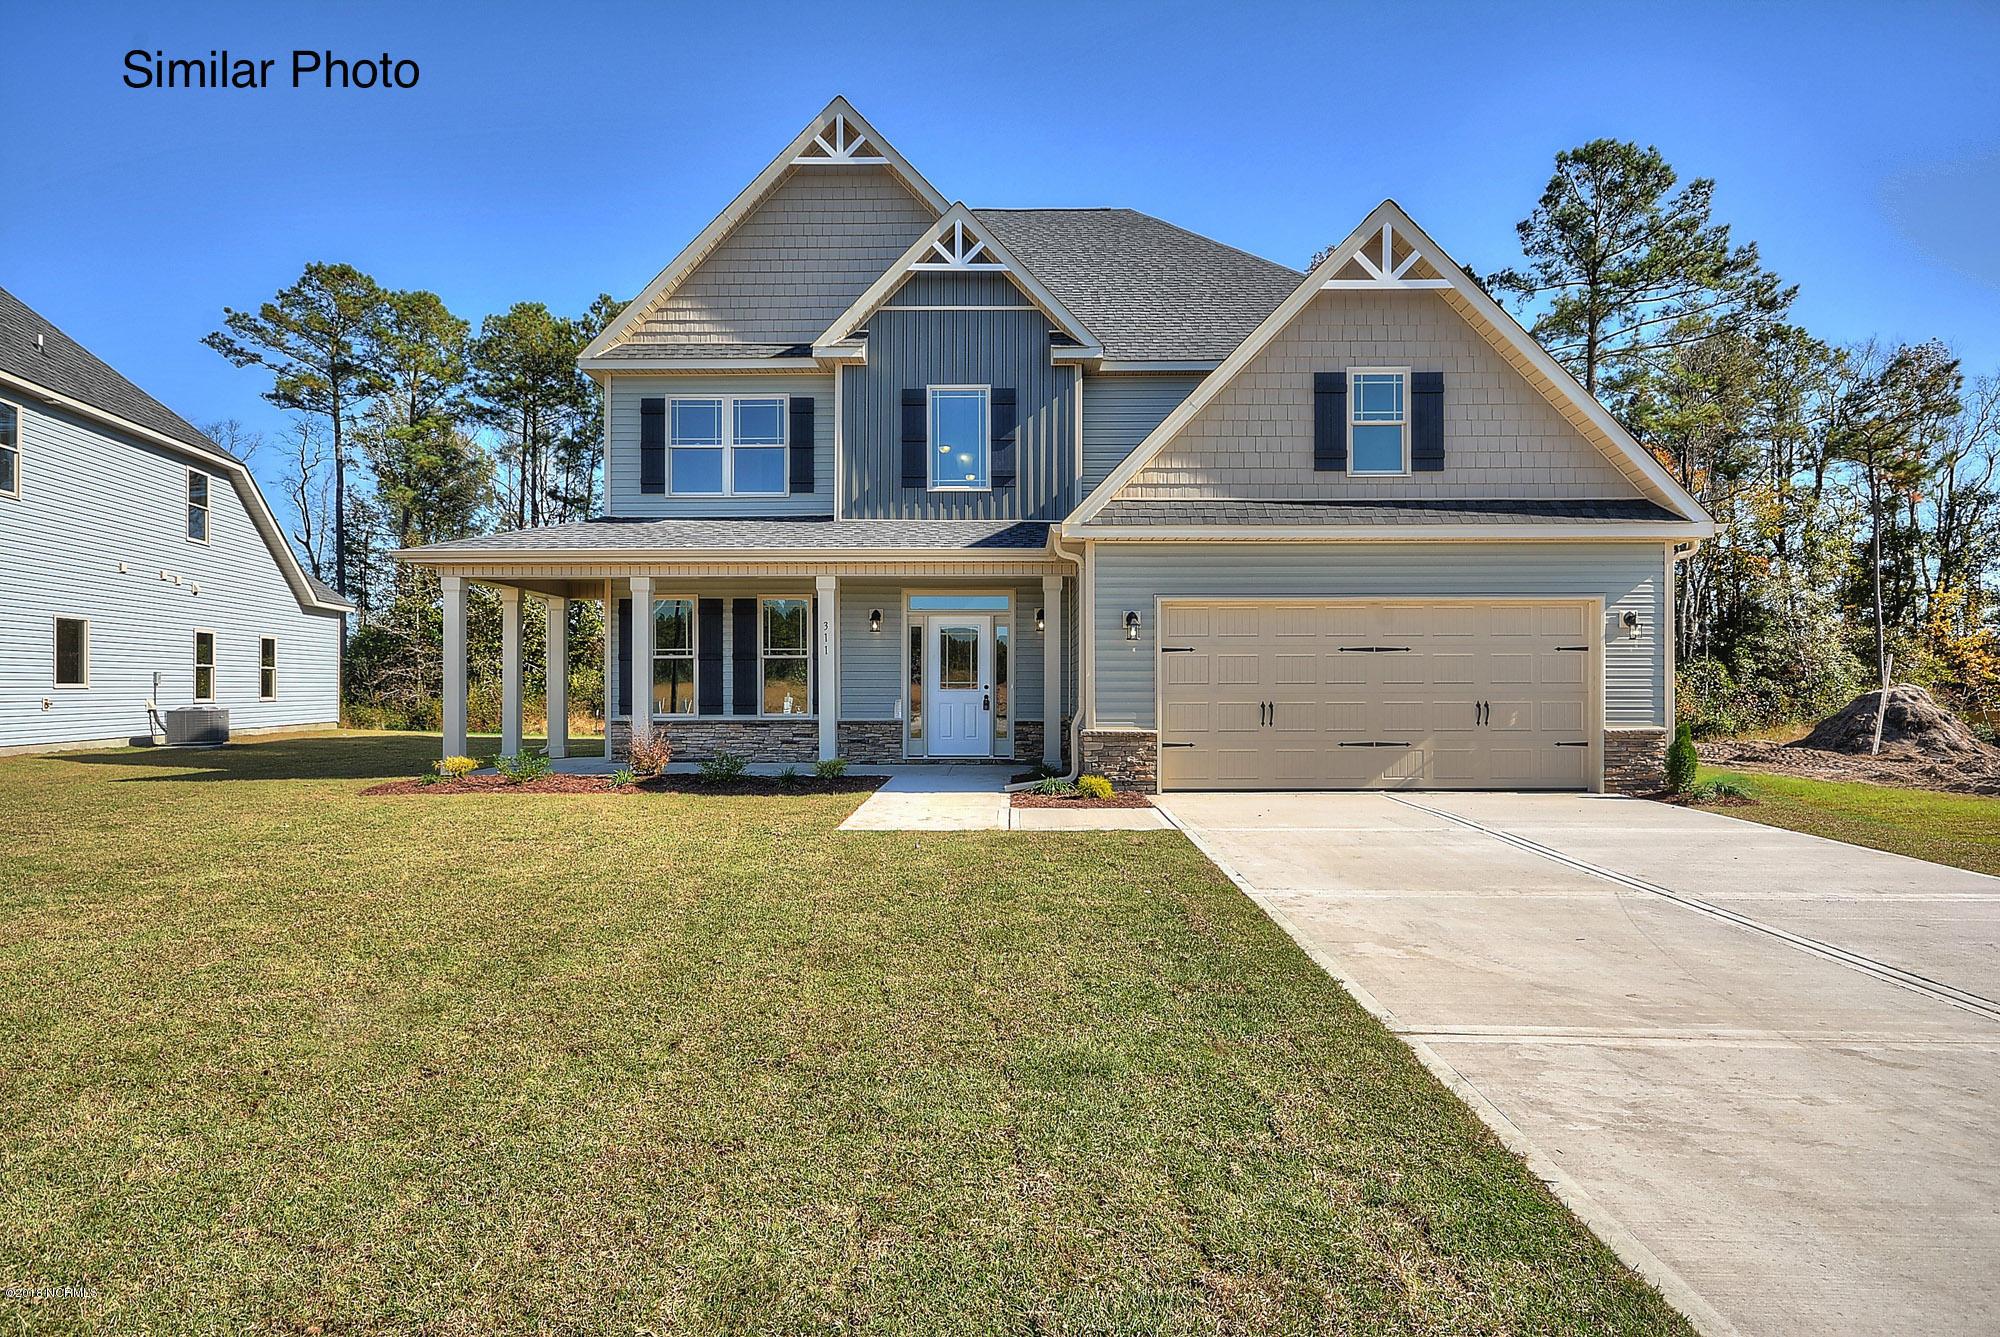 338 Bear Run, Jacksonville, North Carolina 28540, 4 Bedrooms Bedrooms, ,3 BathroomsBathrooms,Residential,For Sale,Bear Run,100198074